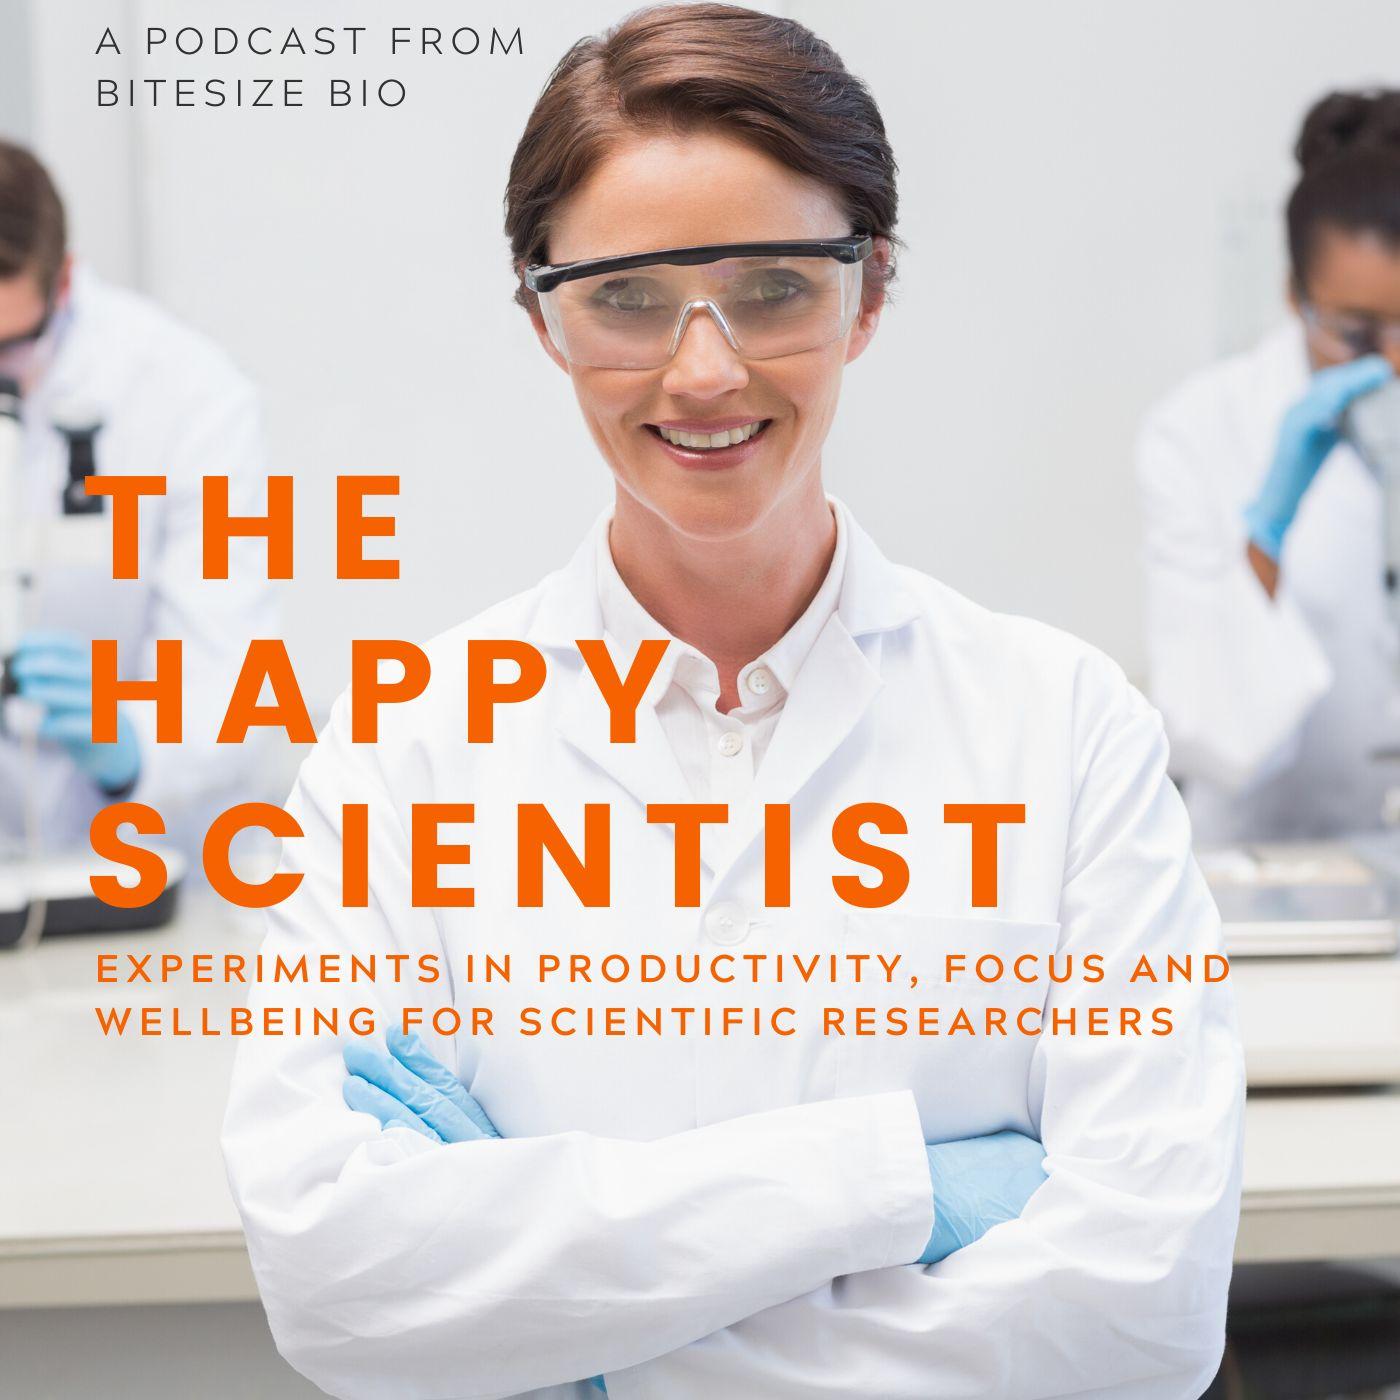 The Happy Scientist